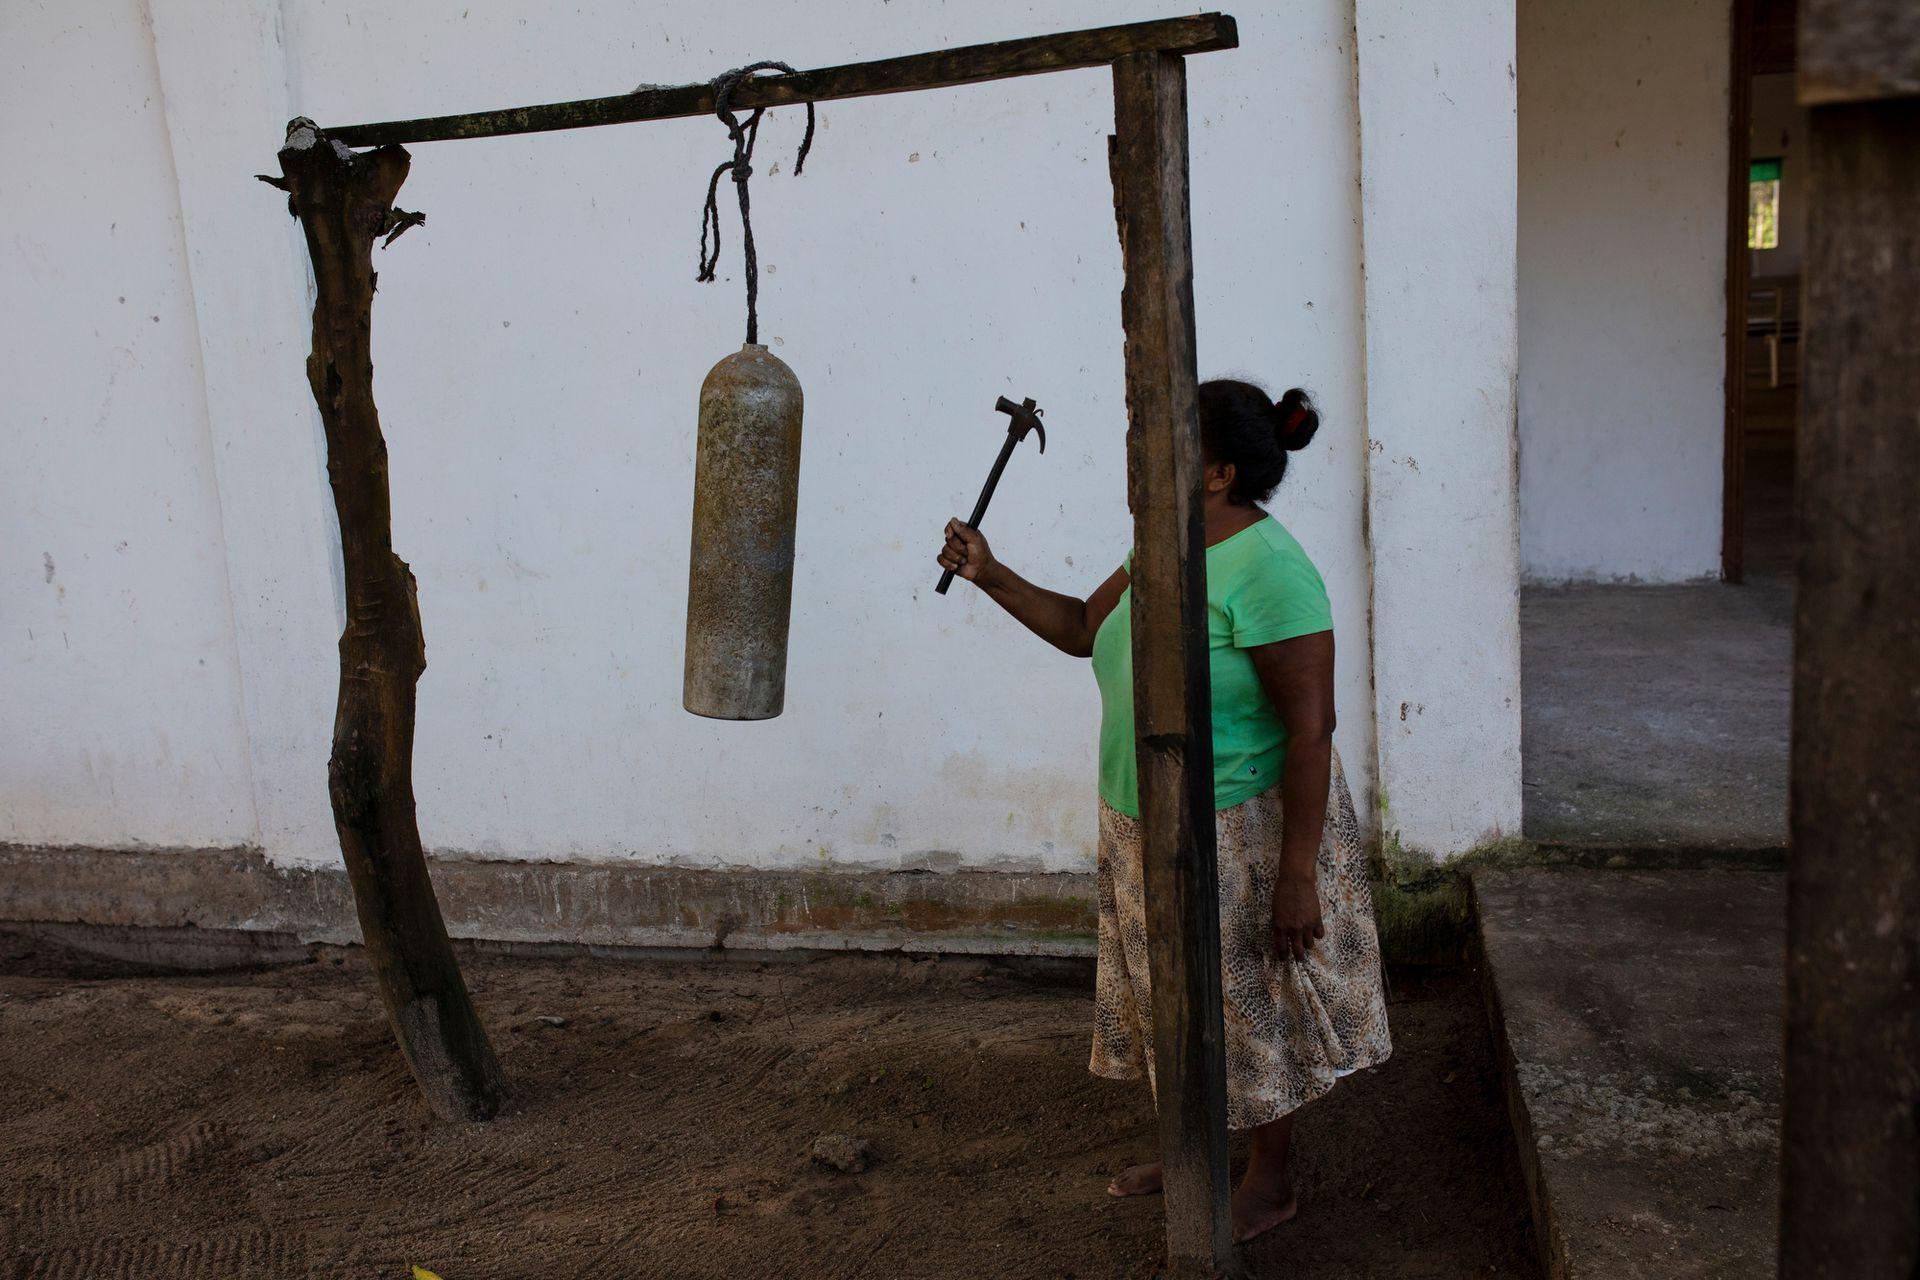 Elvira Mendoza Espinosa anuncia la misa matutina en Kaukira, Honduras